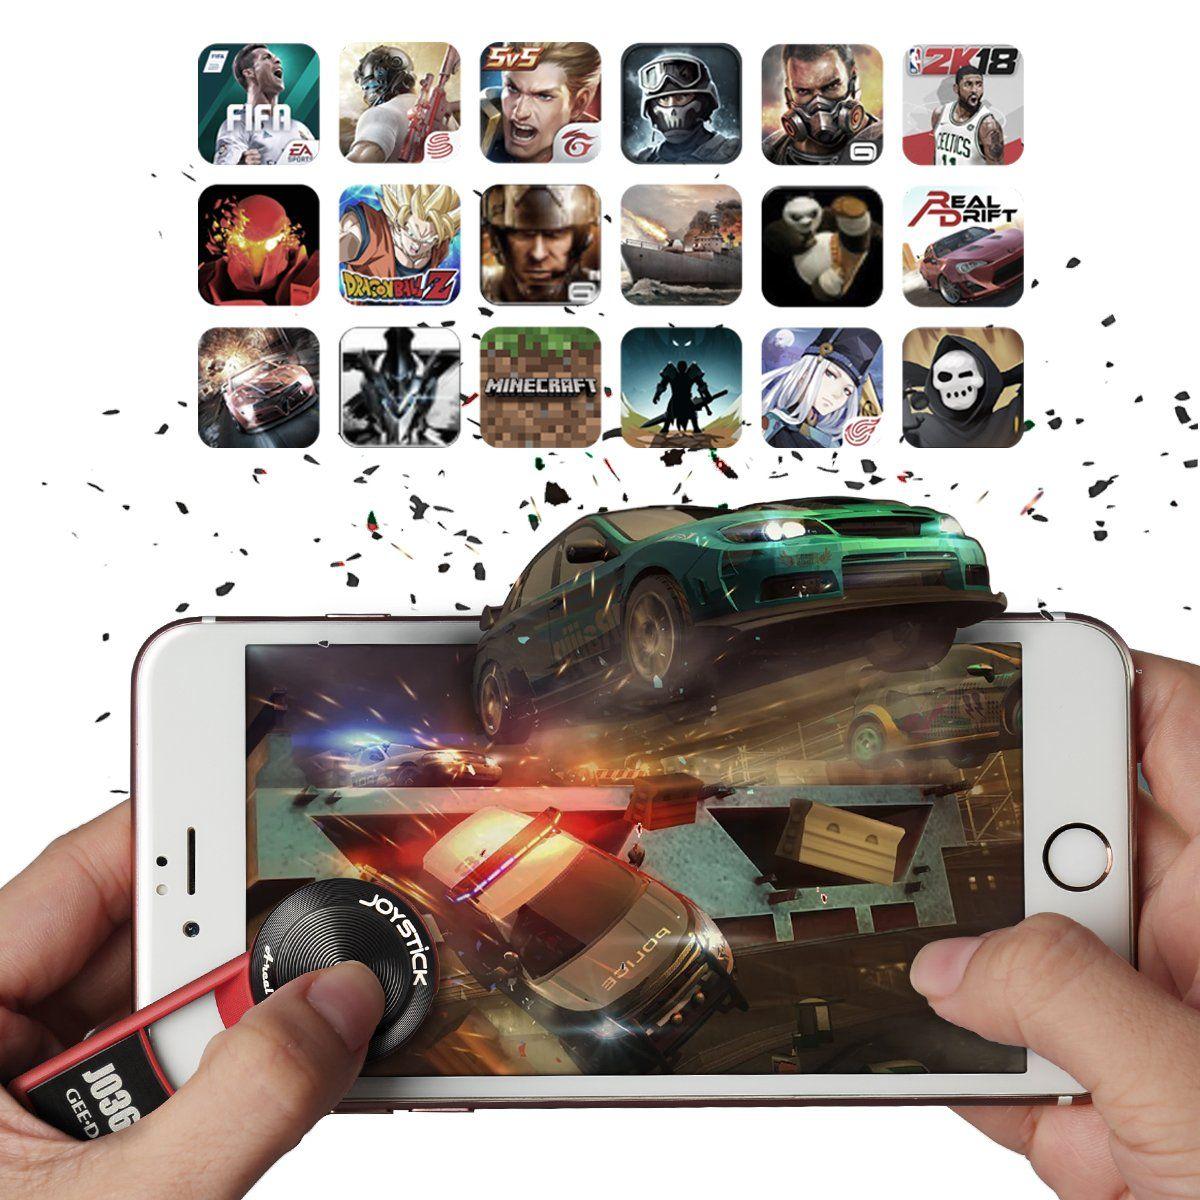 GEE•D J036 Mobile Phone Game Joystick Controller